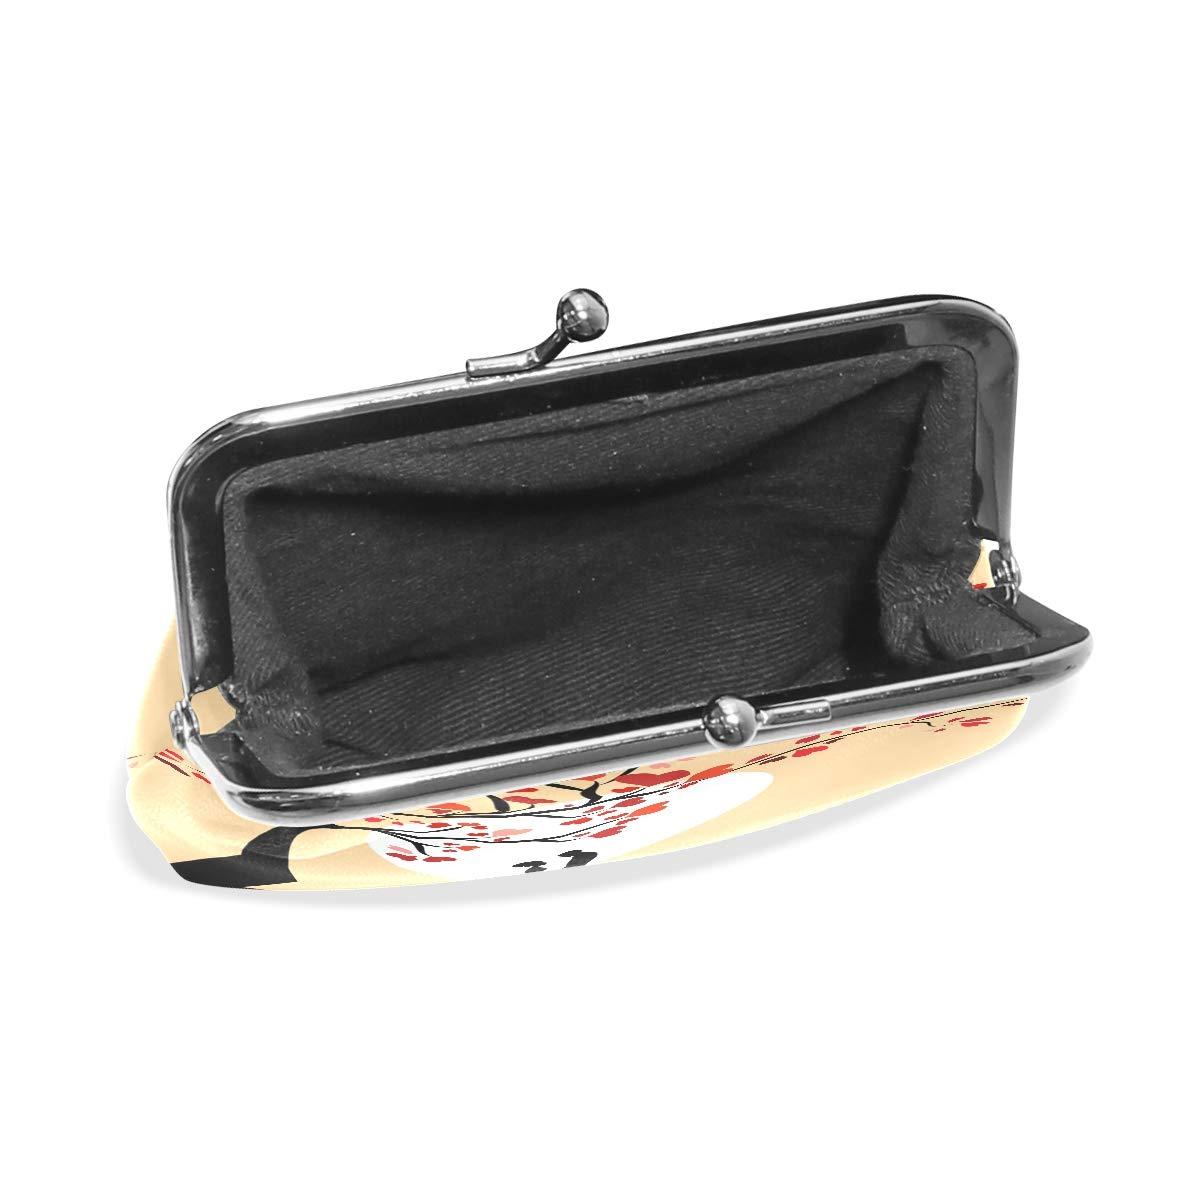 LALATOP Sun Couple Silhouette Womens Coin Pouch Purse wallet Card Holder Clutch Handbag